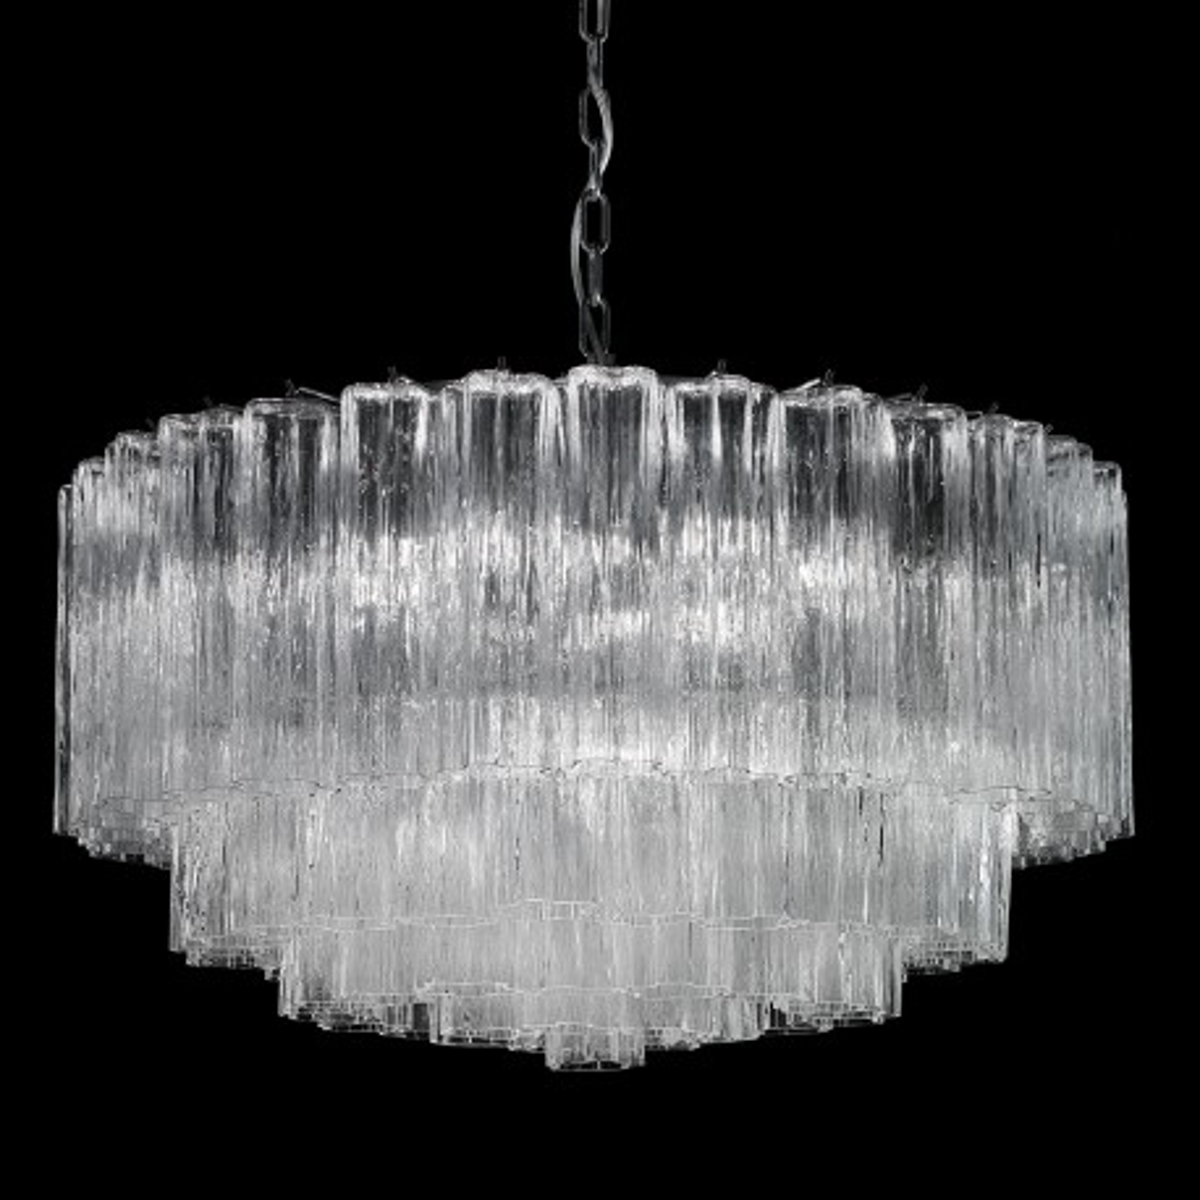 """Holly"" Murano glas Kronleuchter - 6 flammig - transparent und chrom"